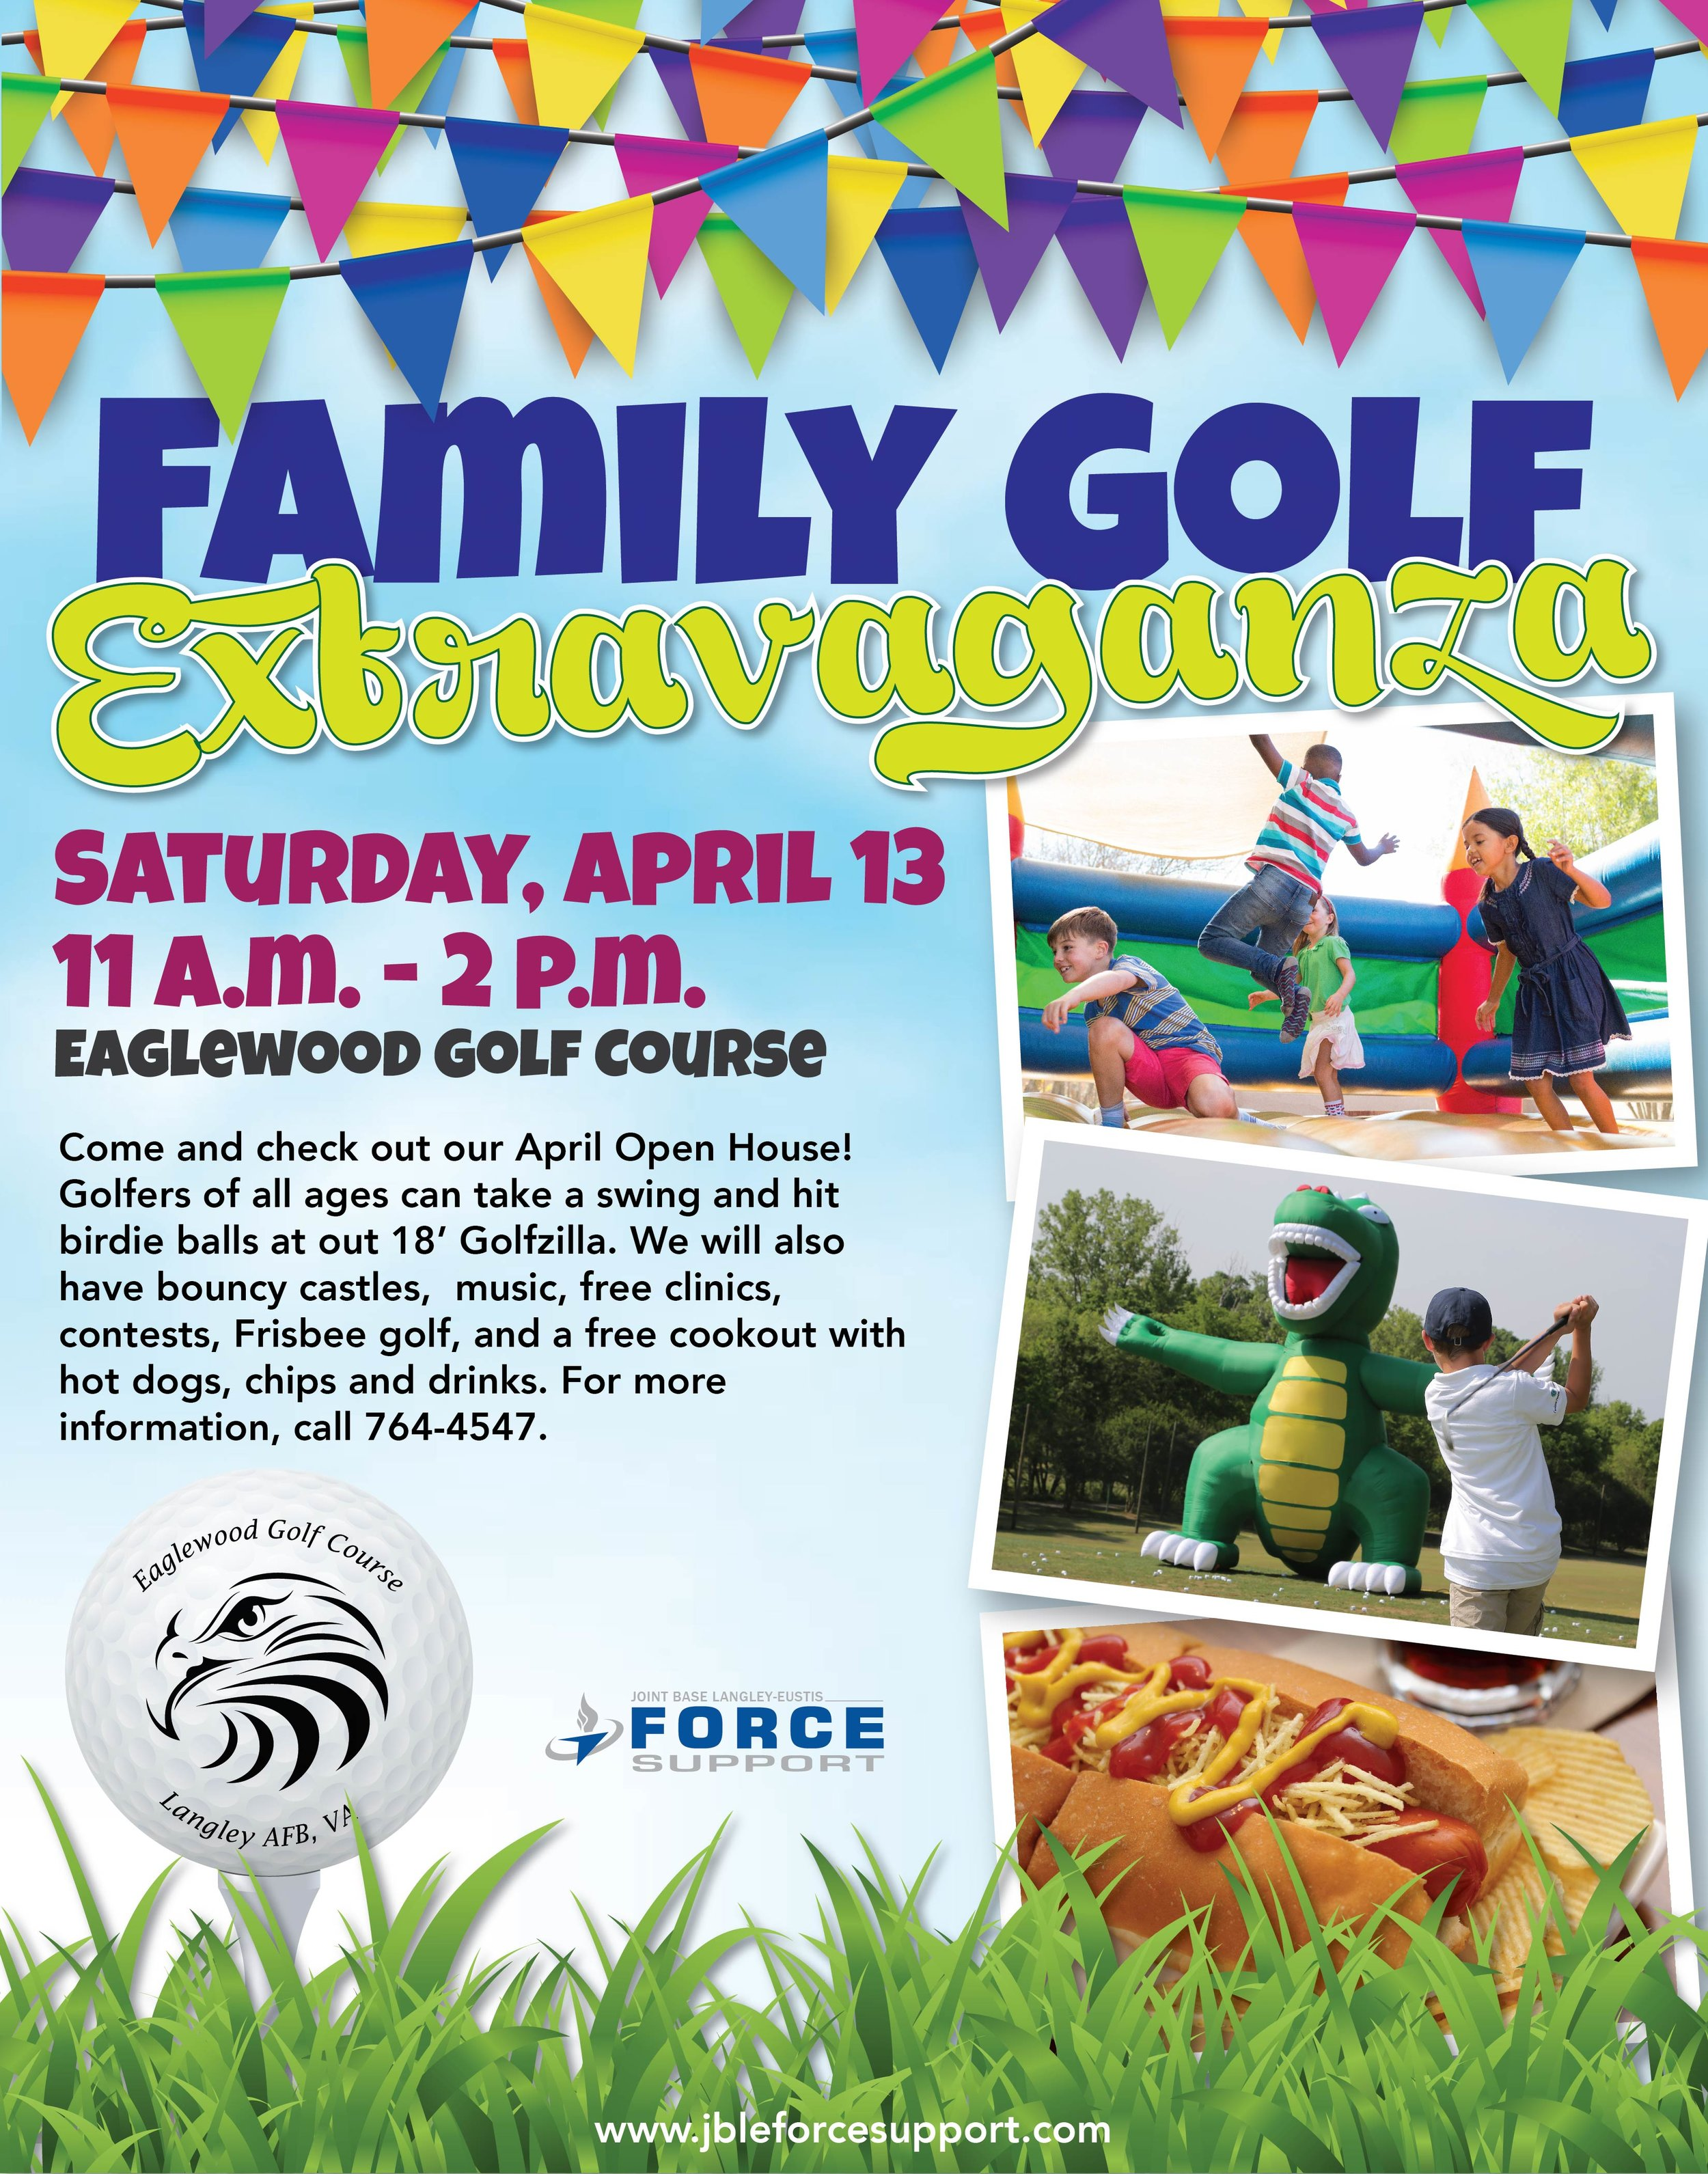 Family Golf Extravaganza.jpg